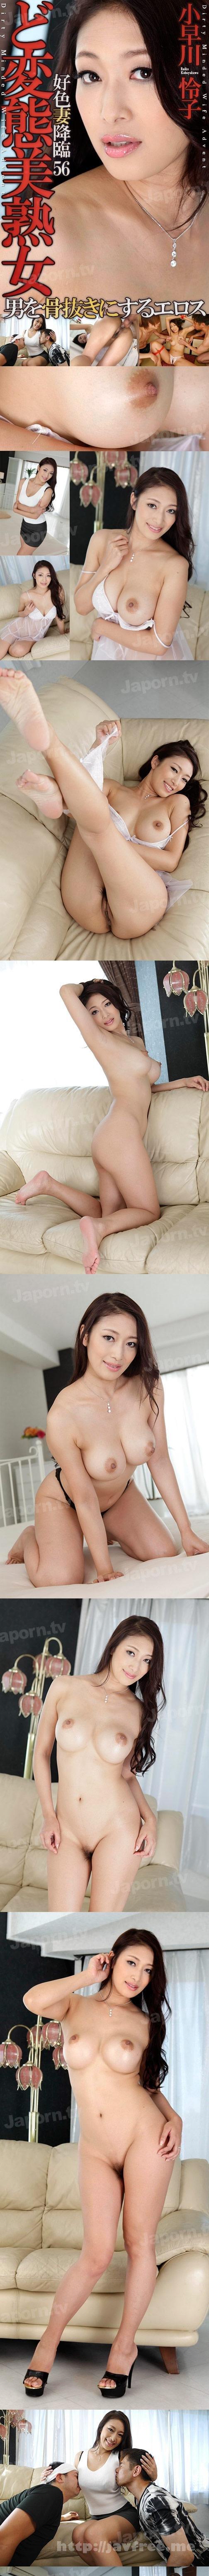 [SKY-328] 好色妻降臨 Vol.56 : 小早川怜子